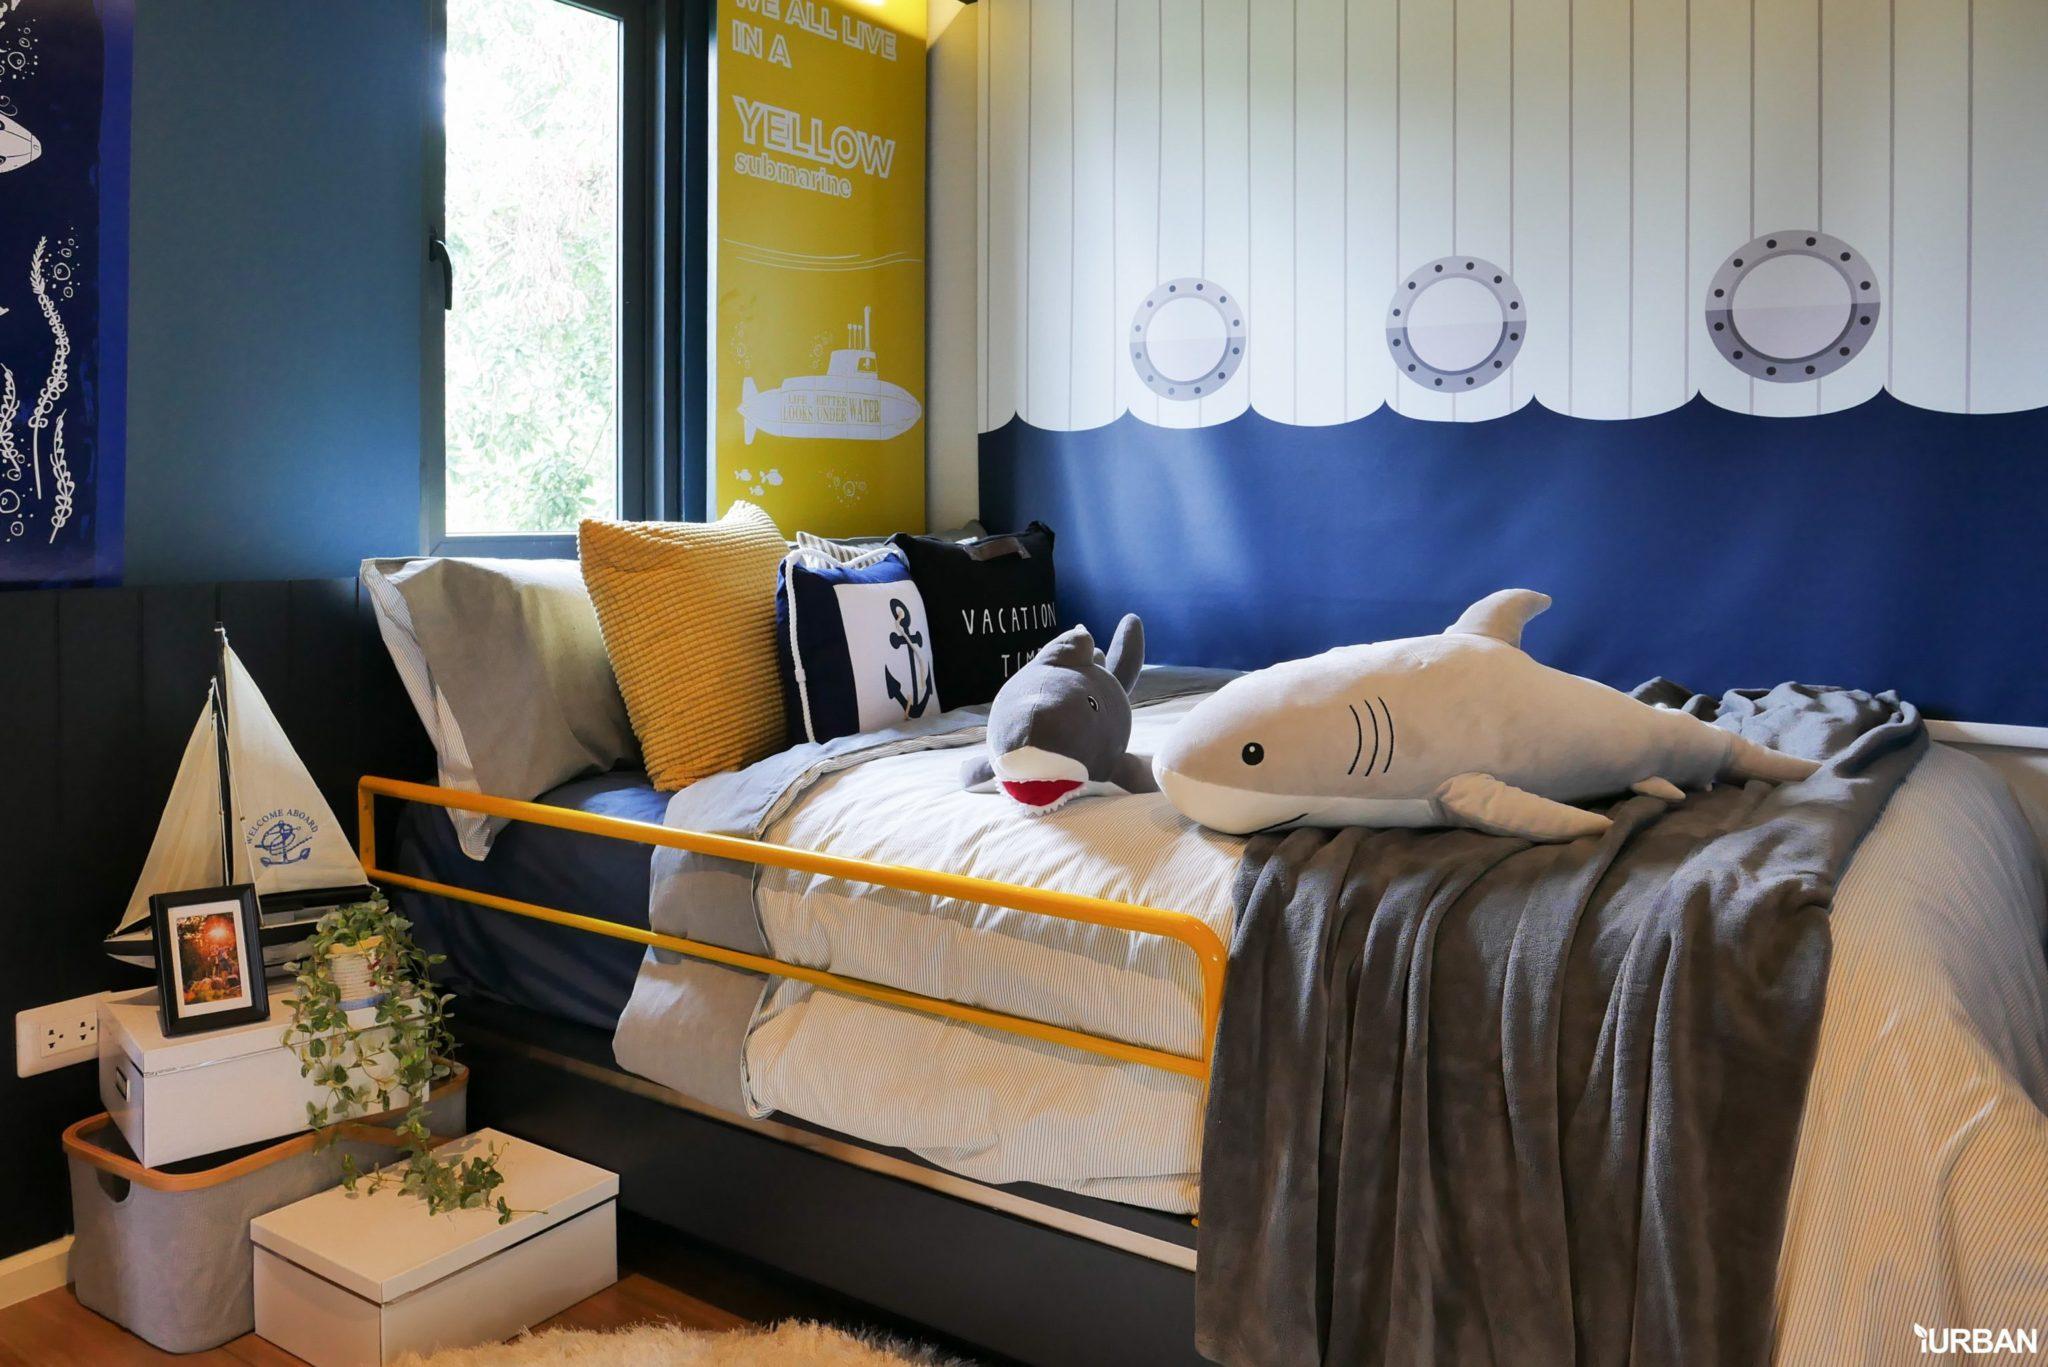 CENTRO ราชพฤกษ์ 2 ชมบ้านเดี่ยว 4 ห้องนอนของ AP บนทำเลรับการมาของเซ็นทรัลใหญ่ 47 - AP (Thailand) - เอพี (ไทยแลนด์)